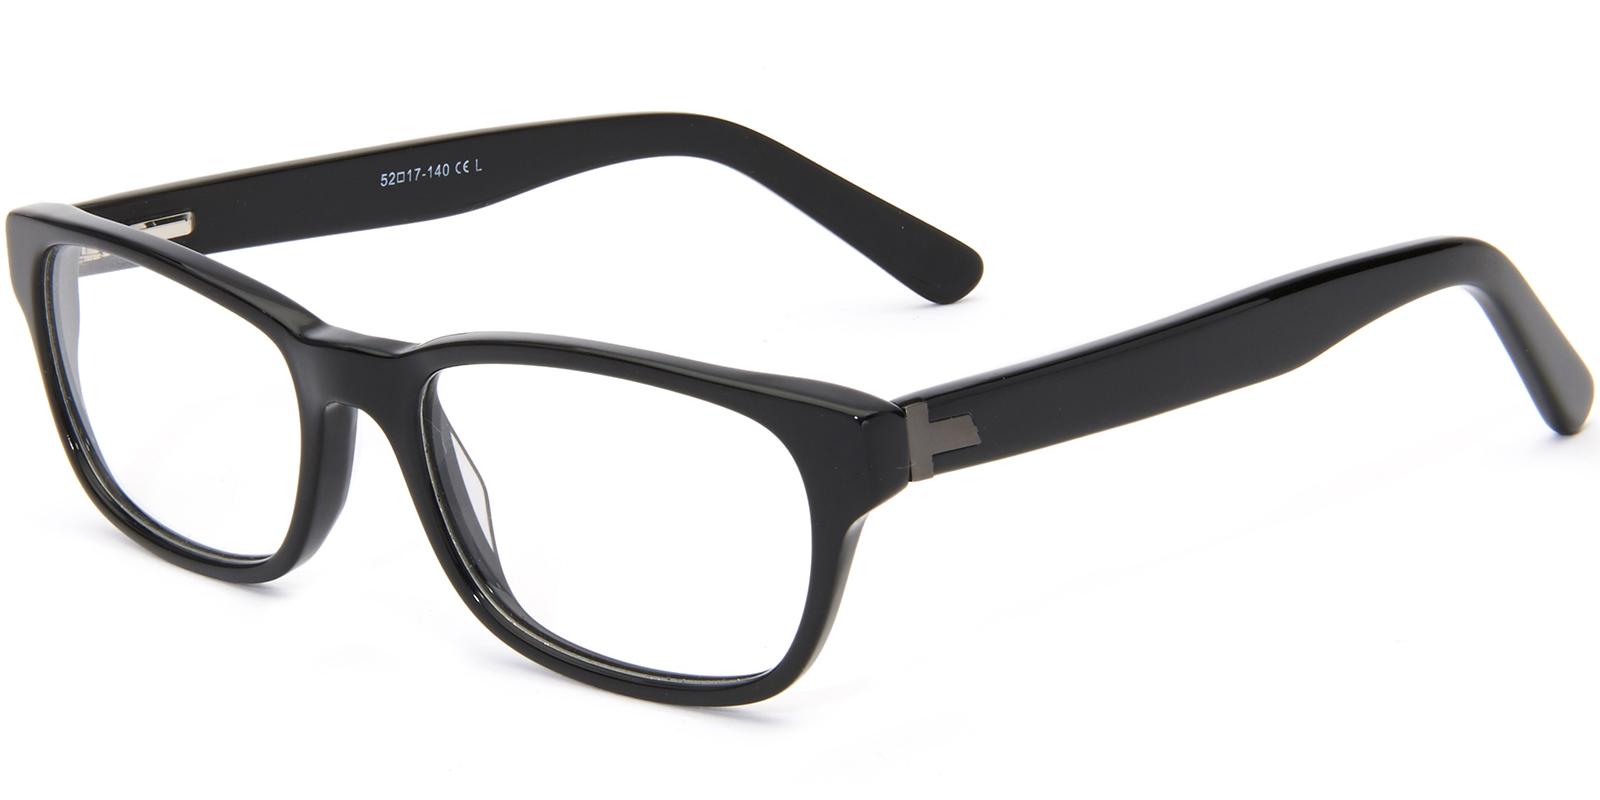 ds collection glasses a152 direct sight. Black Bedroom Furniture Sets. Home Design Ideas